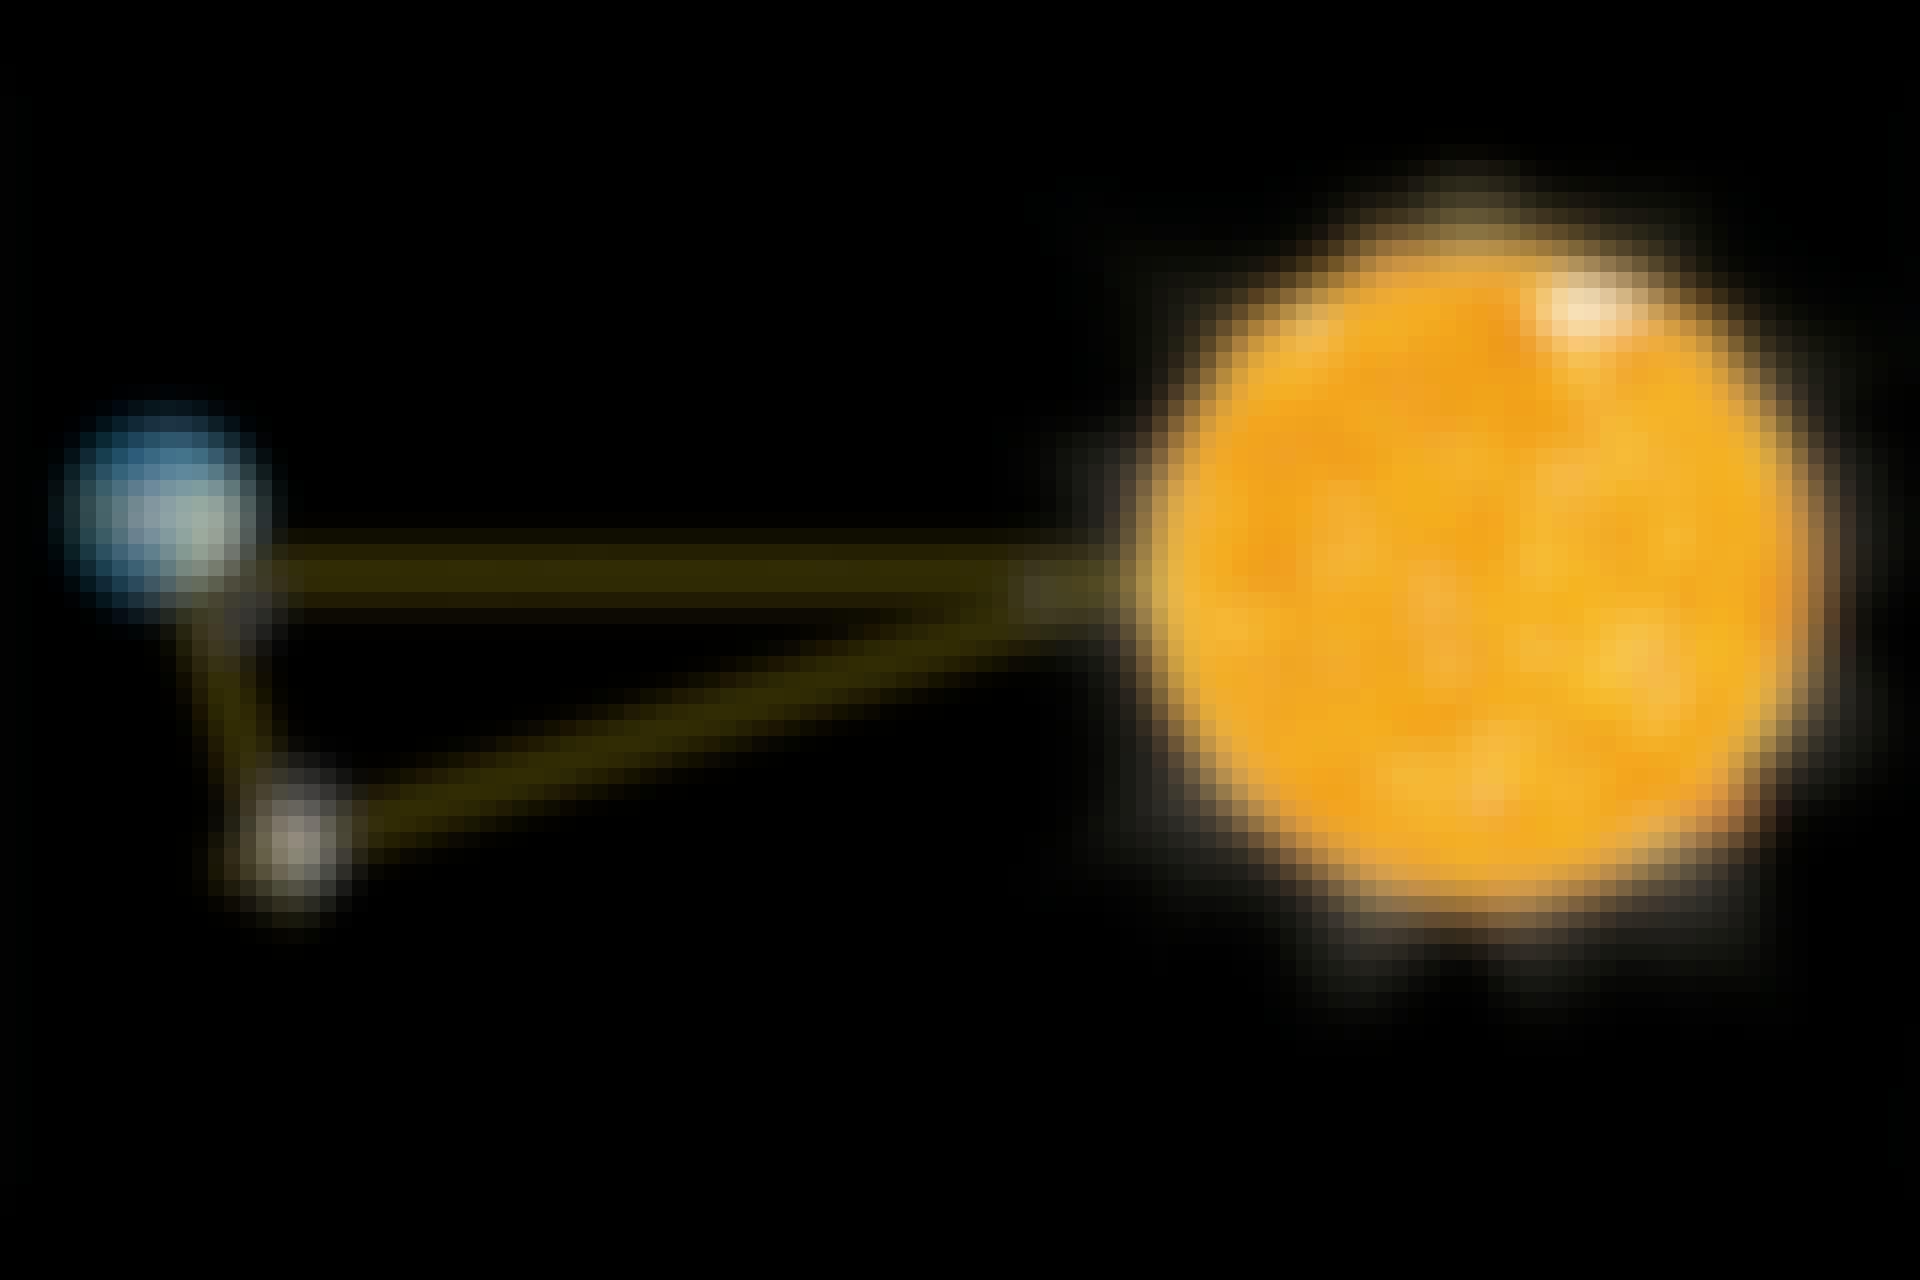 sun distance